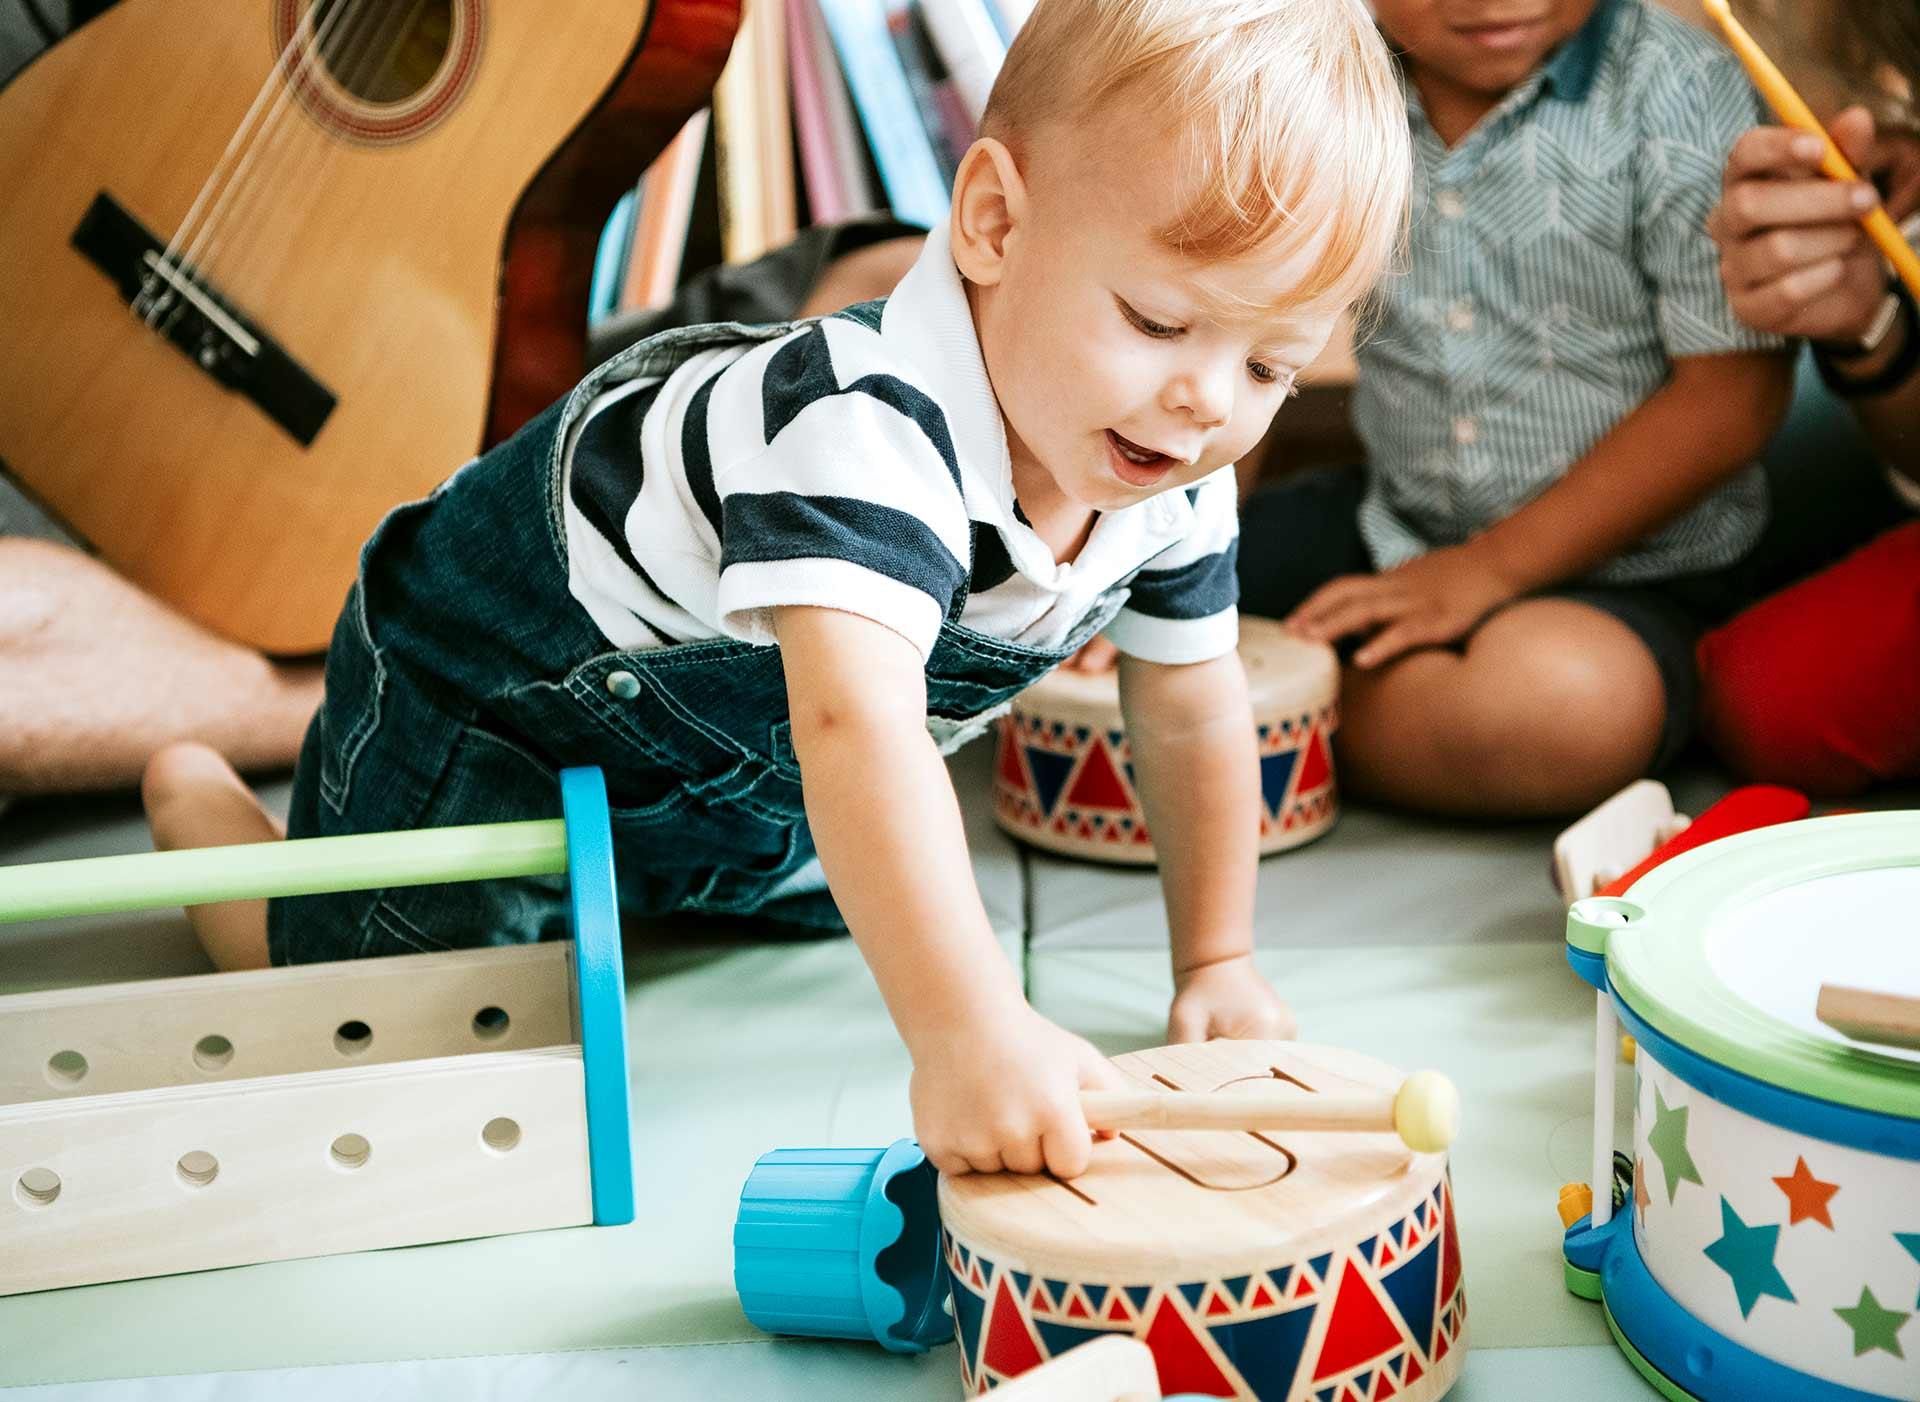 Toddler playing a drum